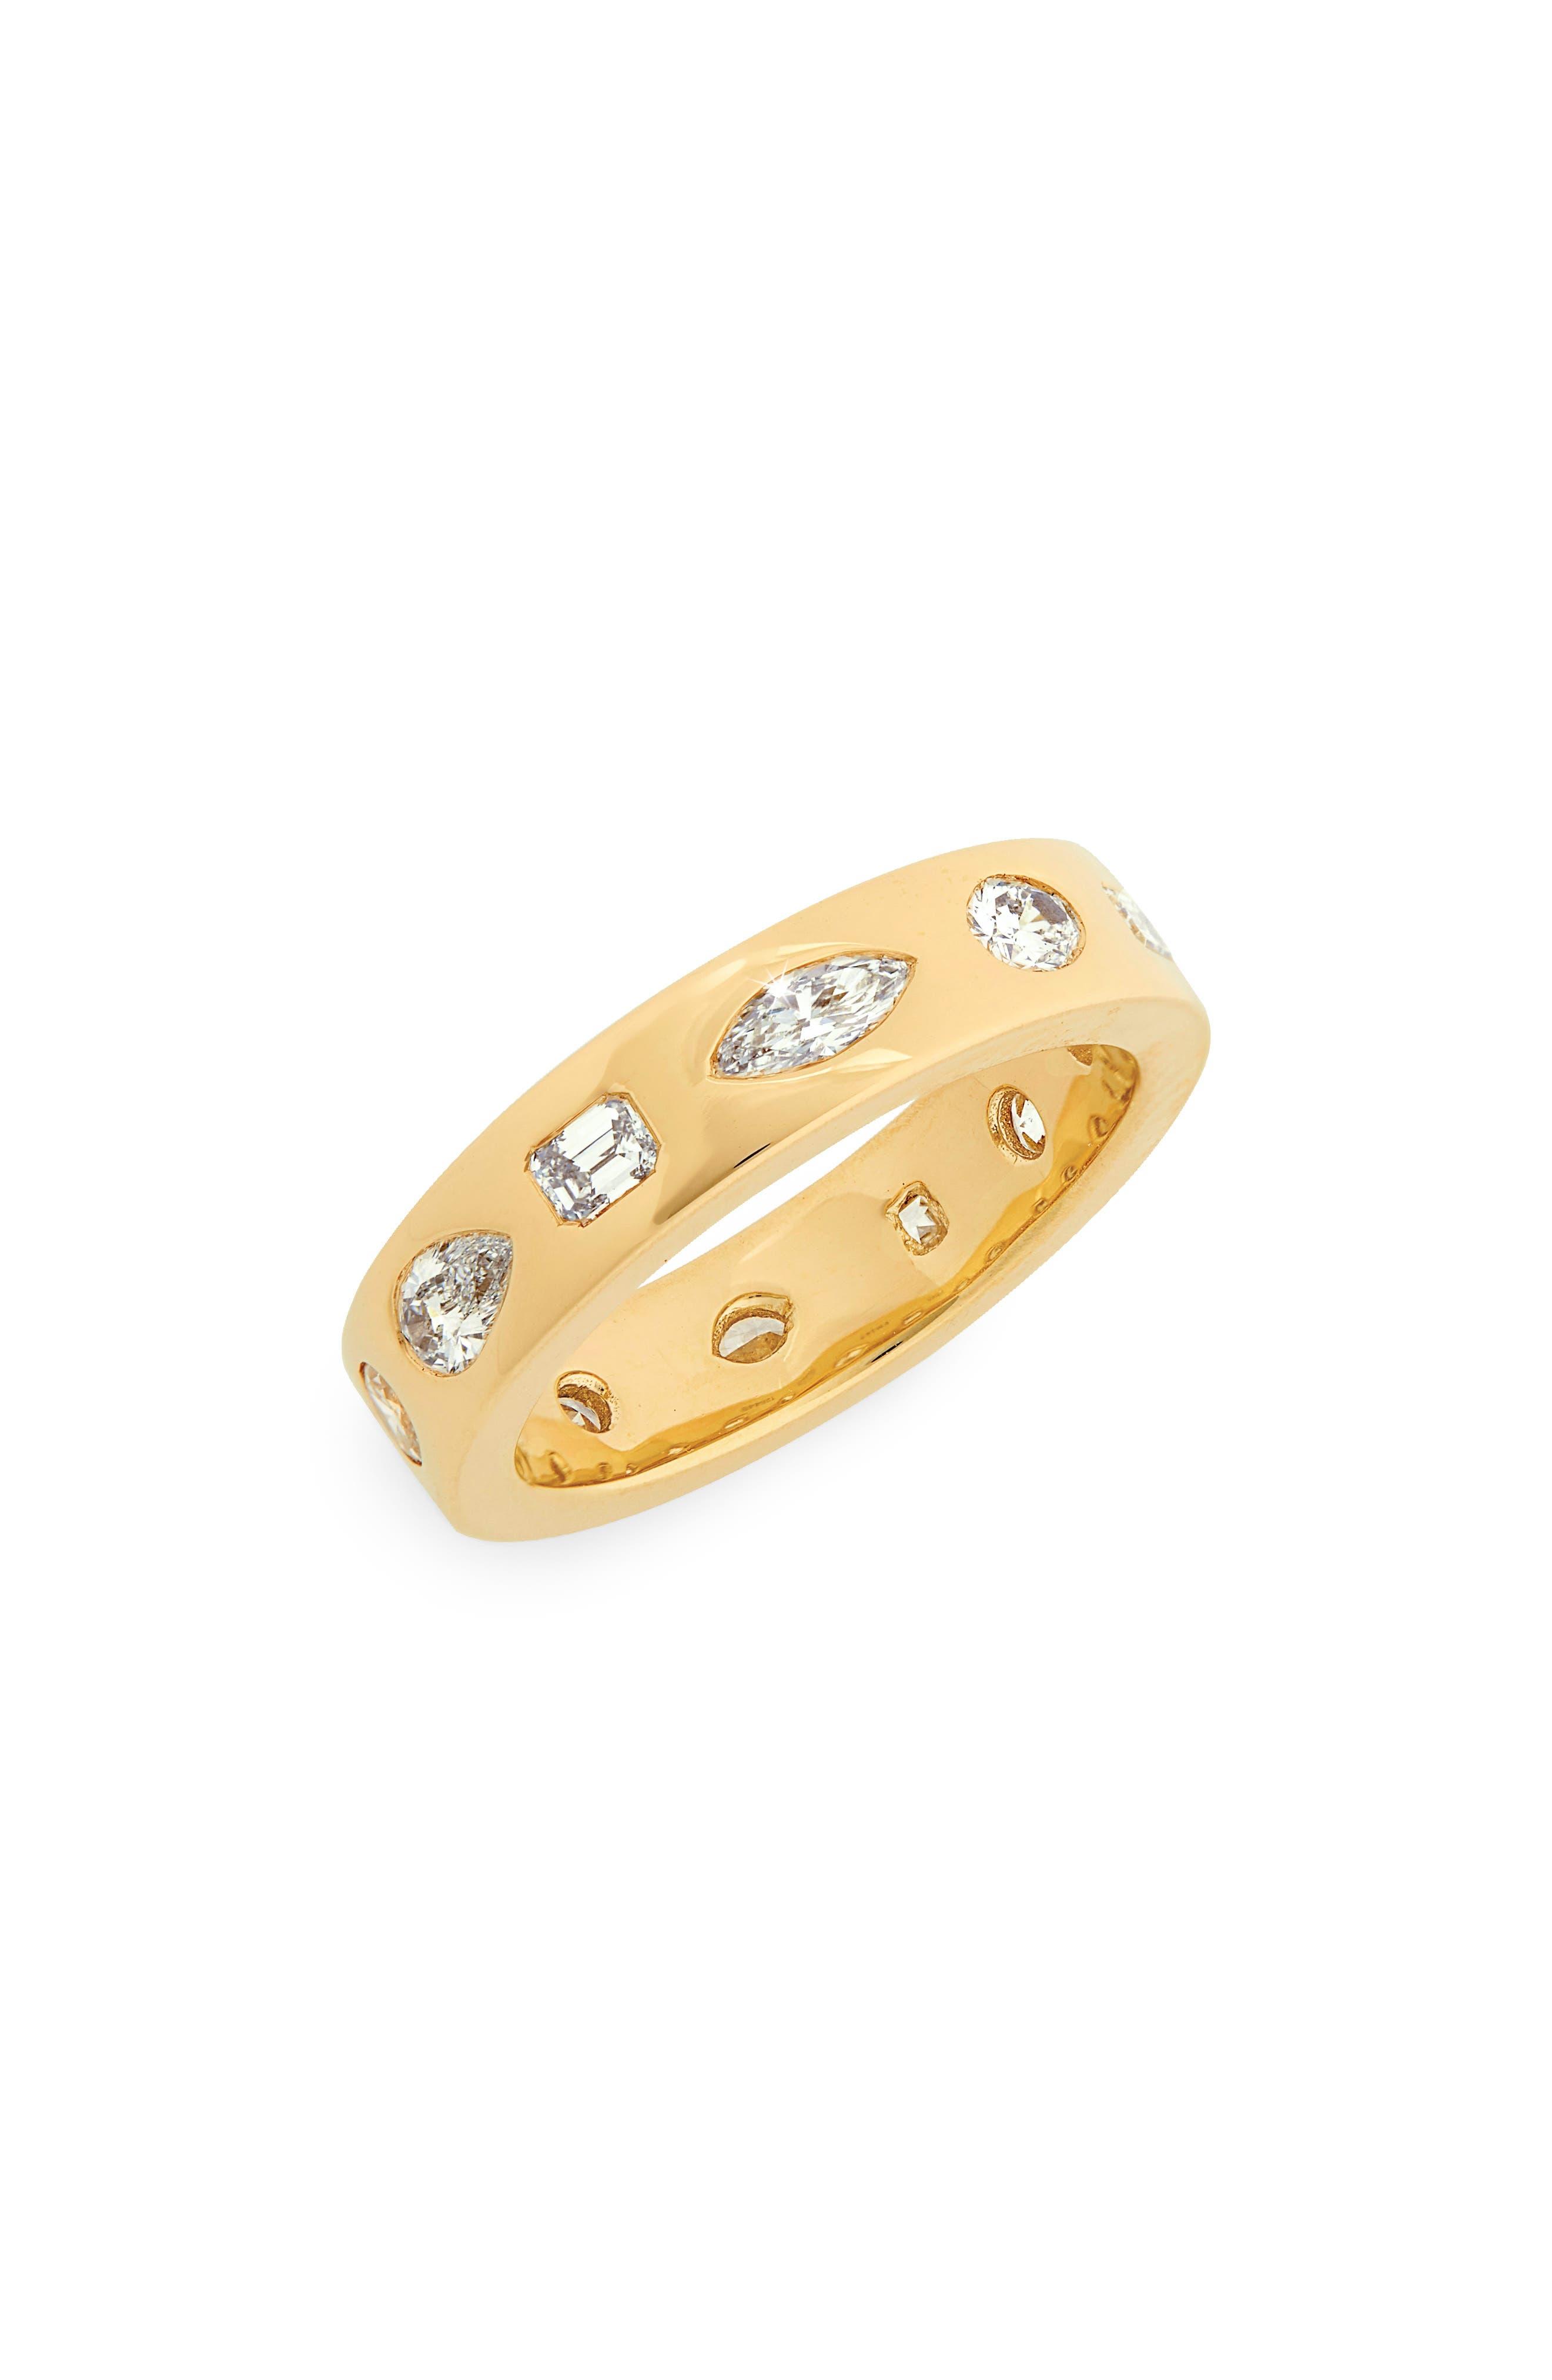 Multi Shape Diamond Stacking Ring,                             Main thumbnail 1, color,                             YELLOW GOLD